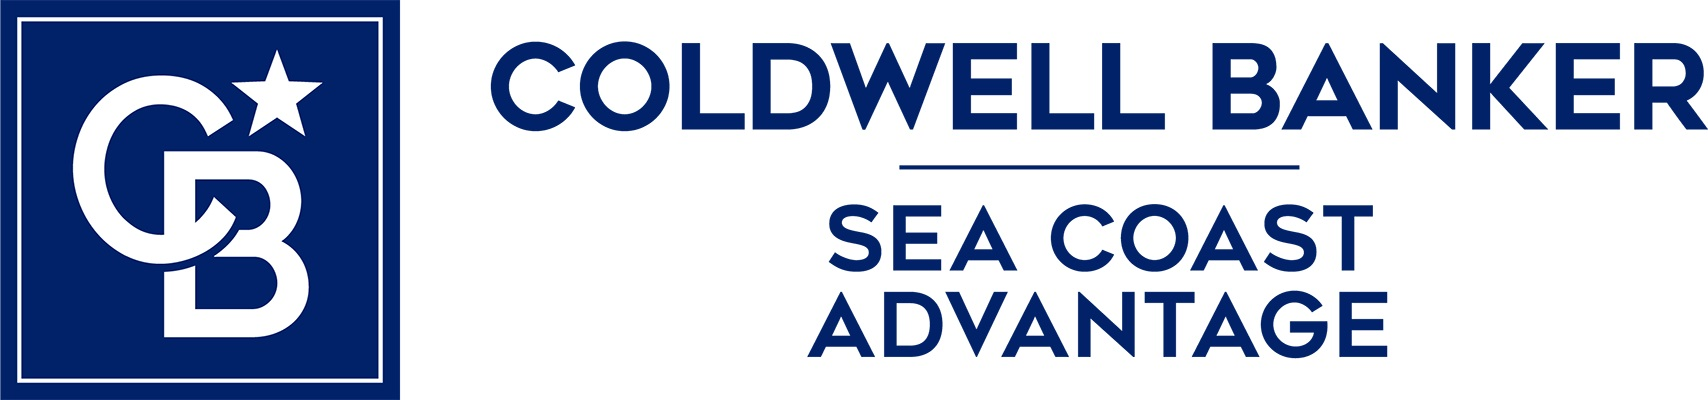 Ingrid Hall - Coldwell Banker Sea Coast Advantage Realty Logo